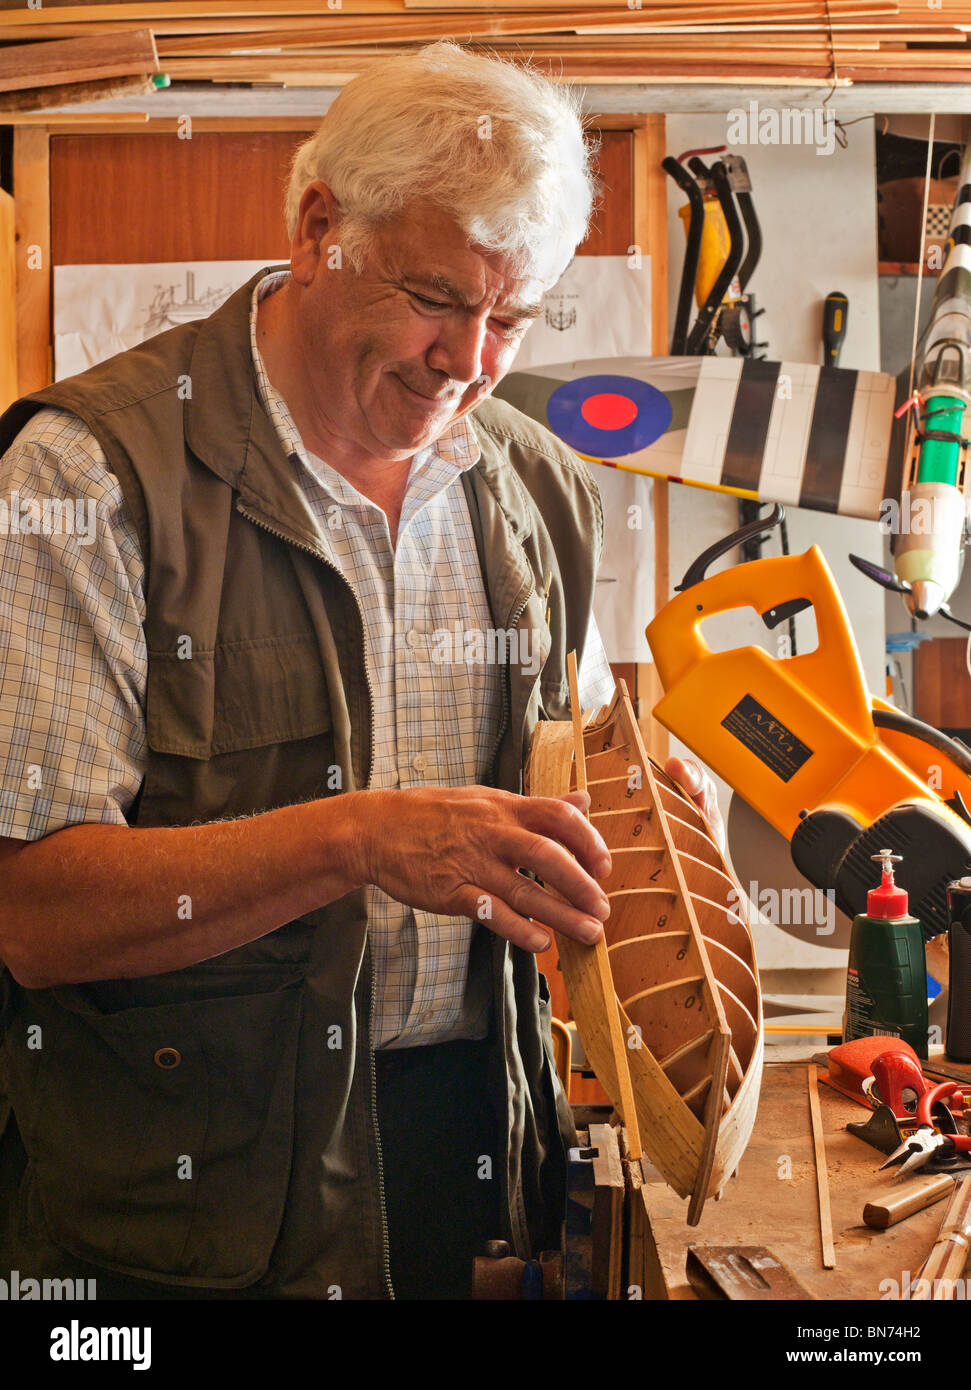 Retired man making wooden model boat. - Stock Image